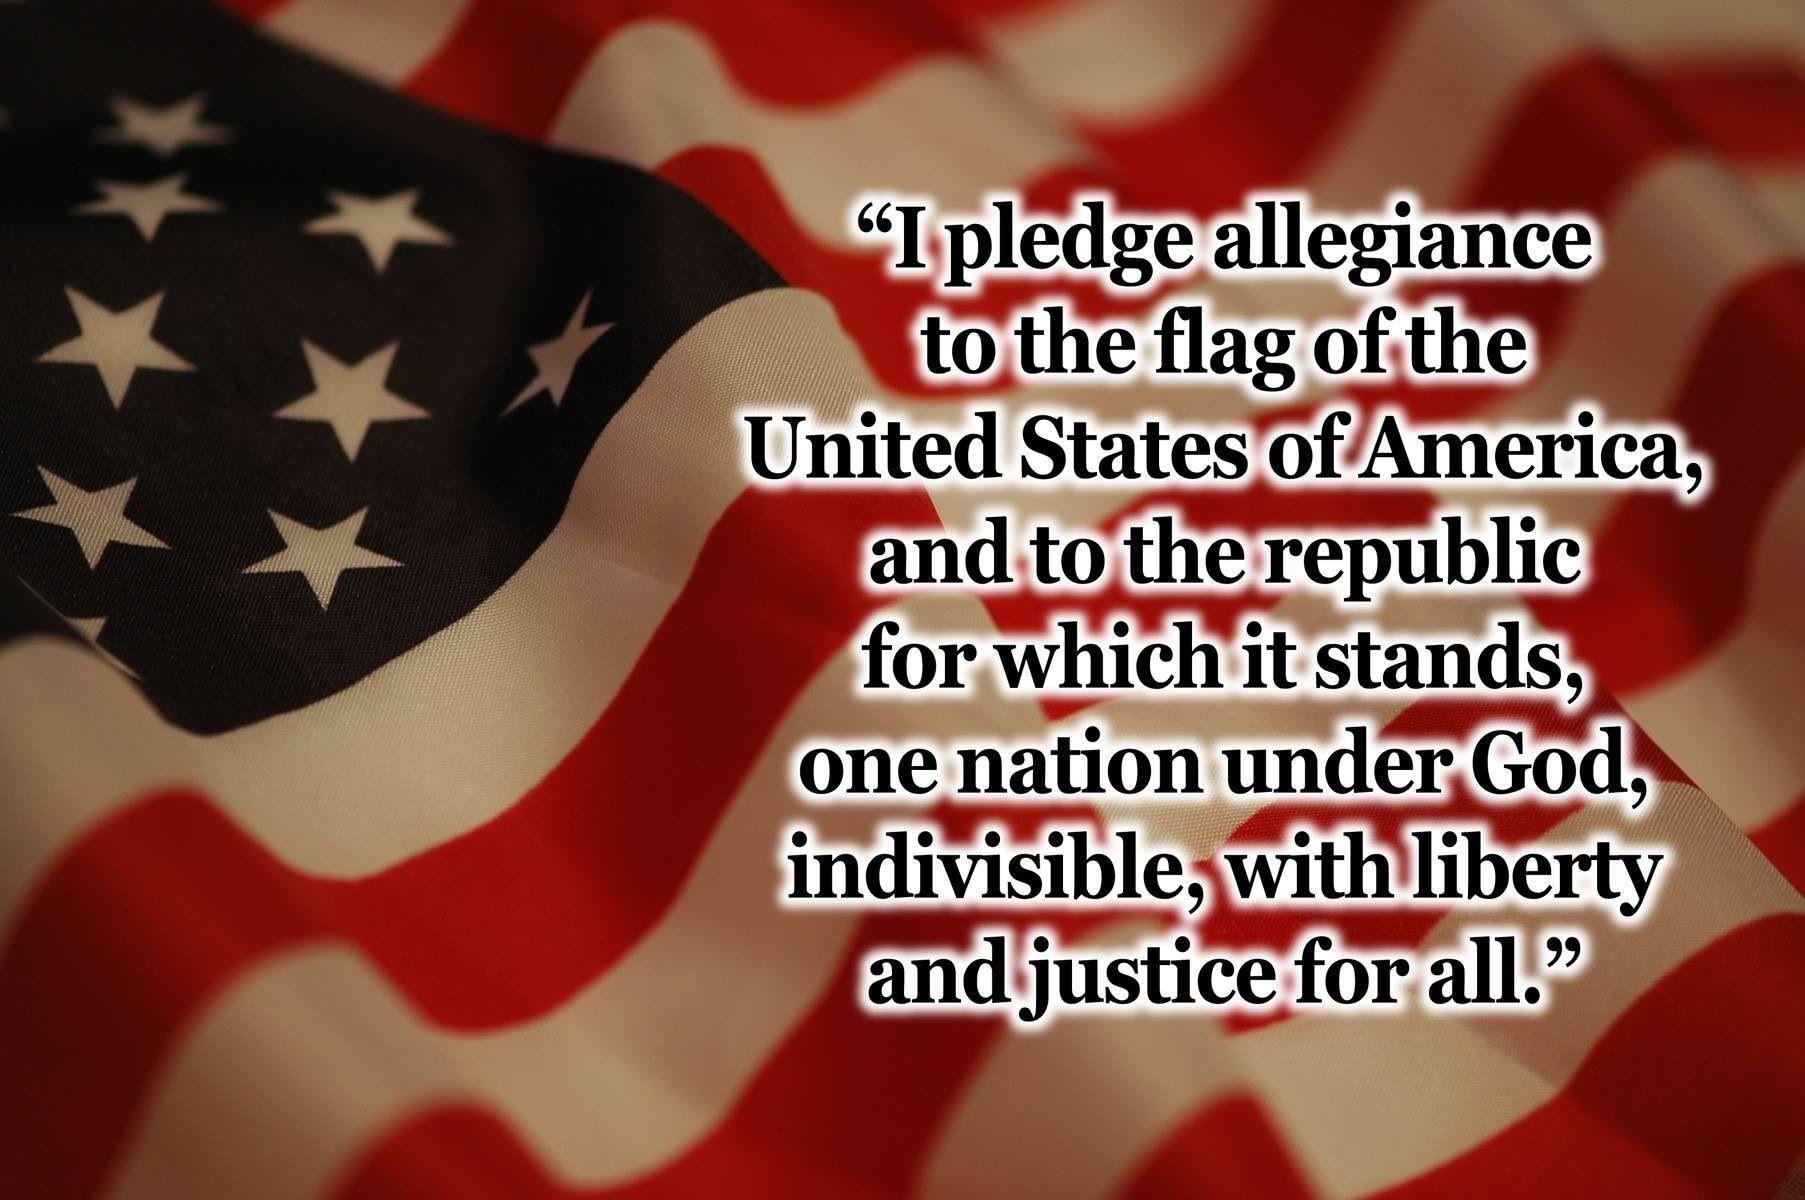 I pledge allegiance to the flag👉🇺🇸.......... Pledge of